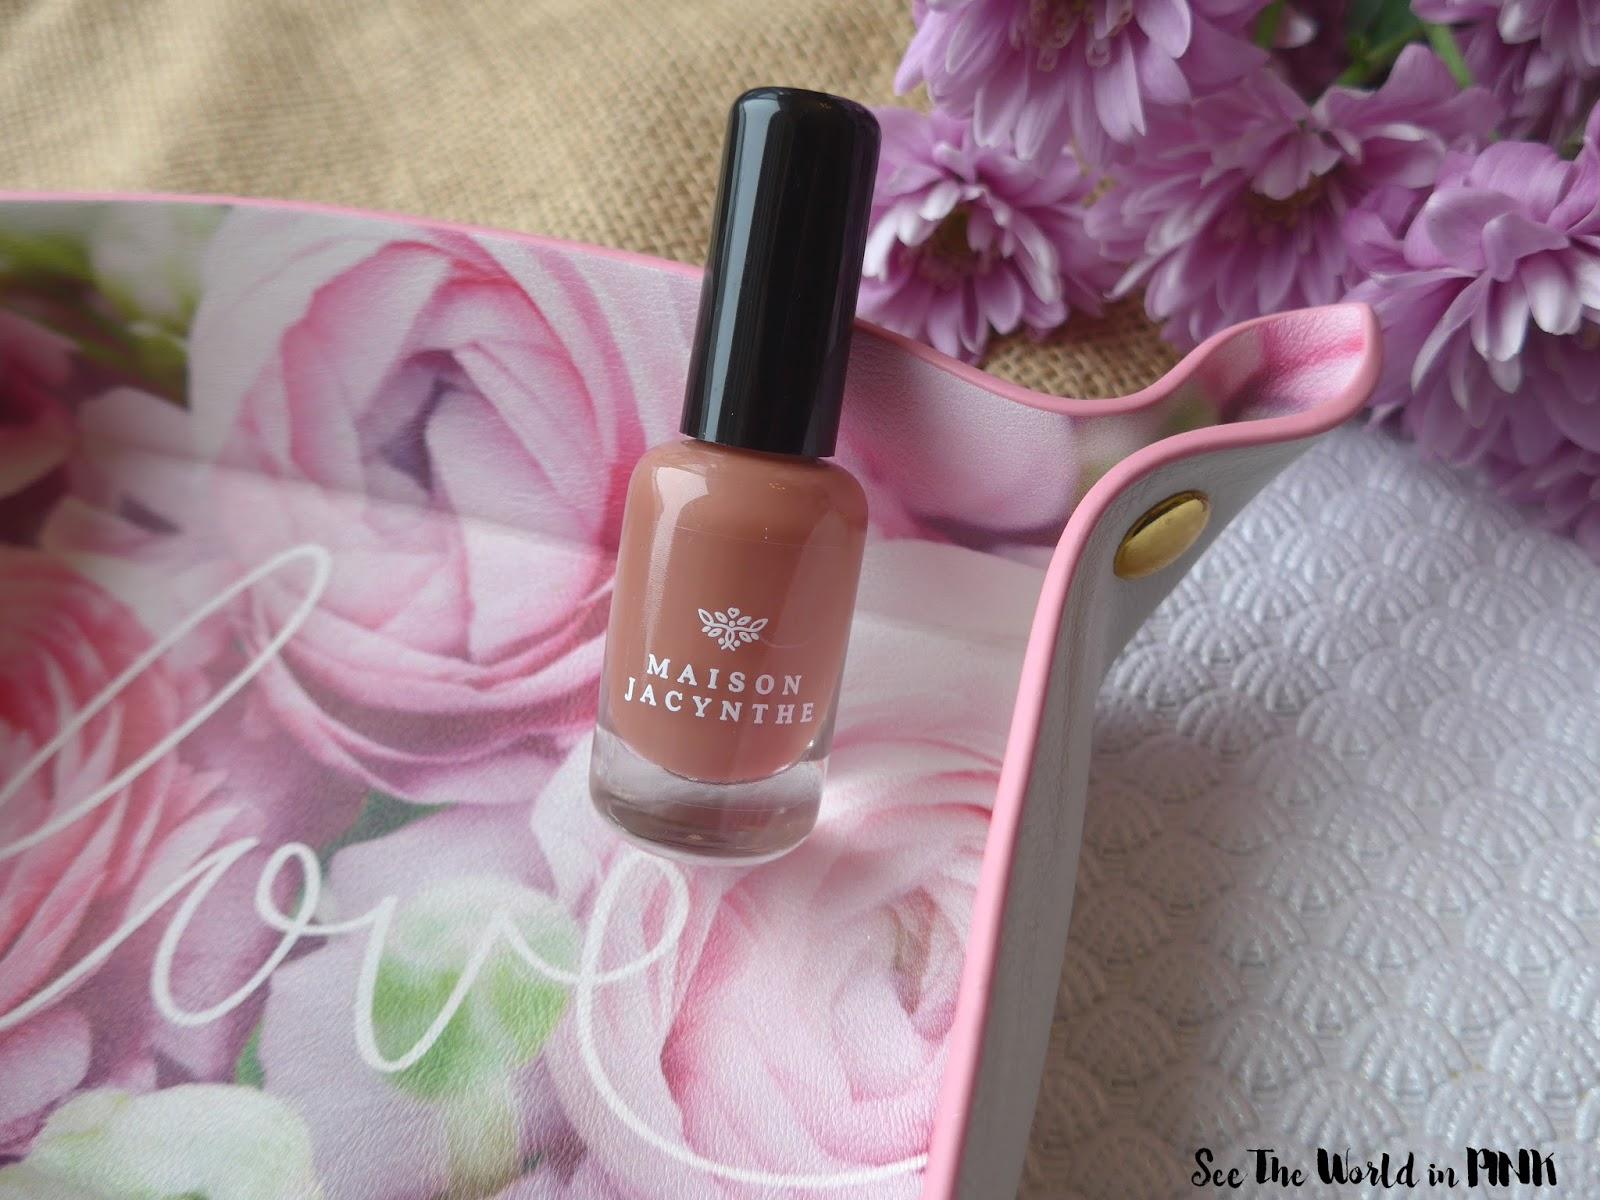 Manicure Tuesday - Maison Jacynthe Nail Polish in Amalfi